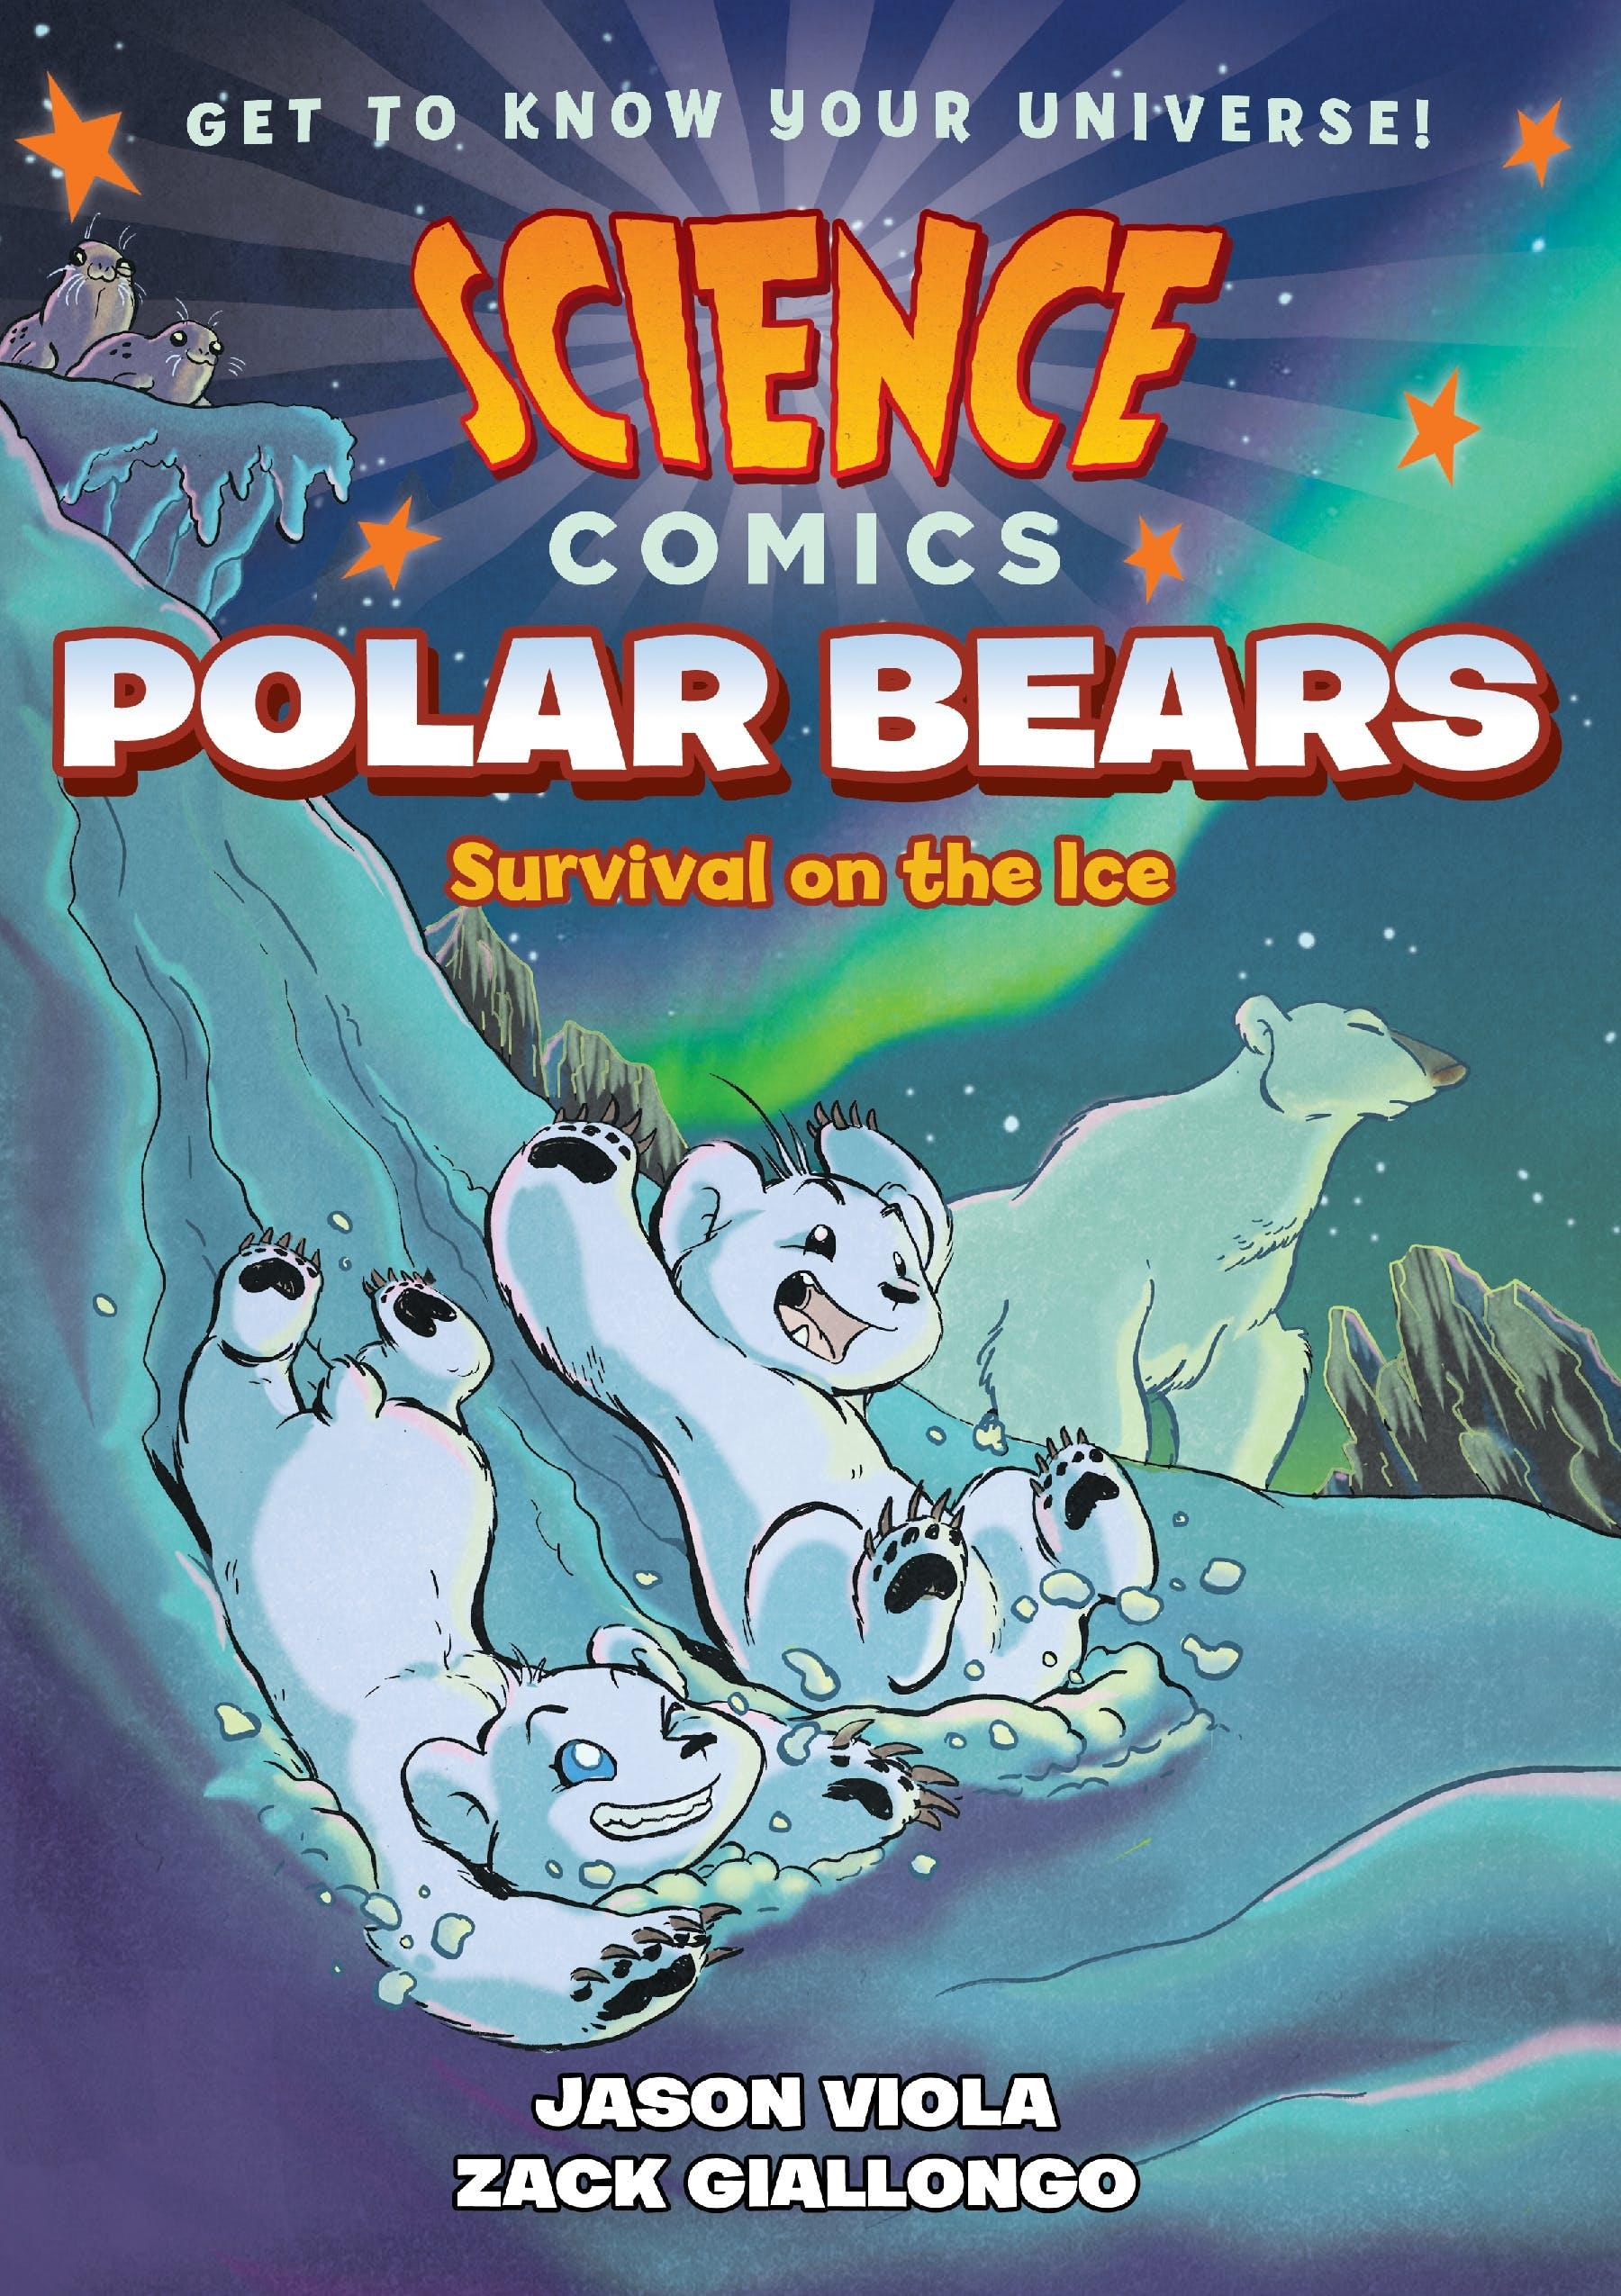 Image of Science Comics: Polar Bears